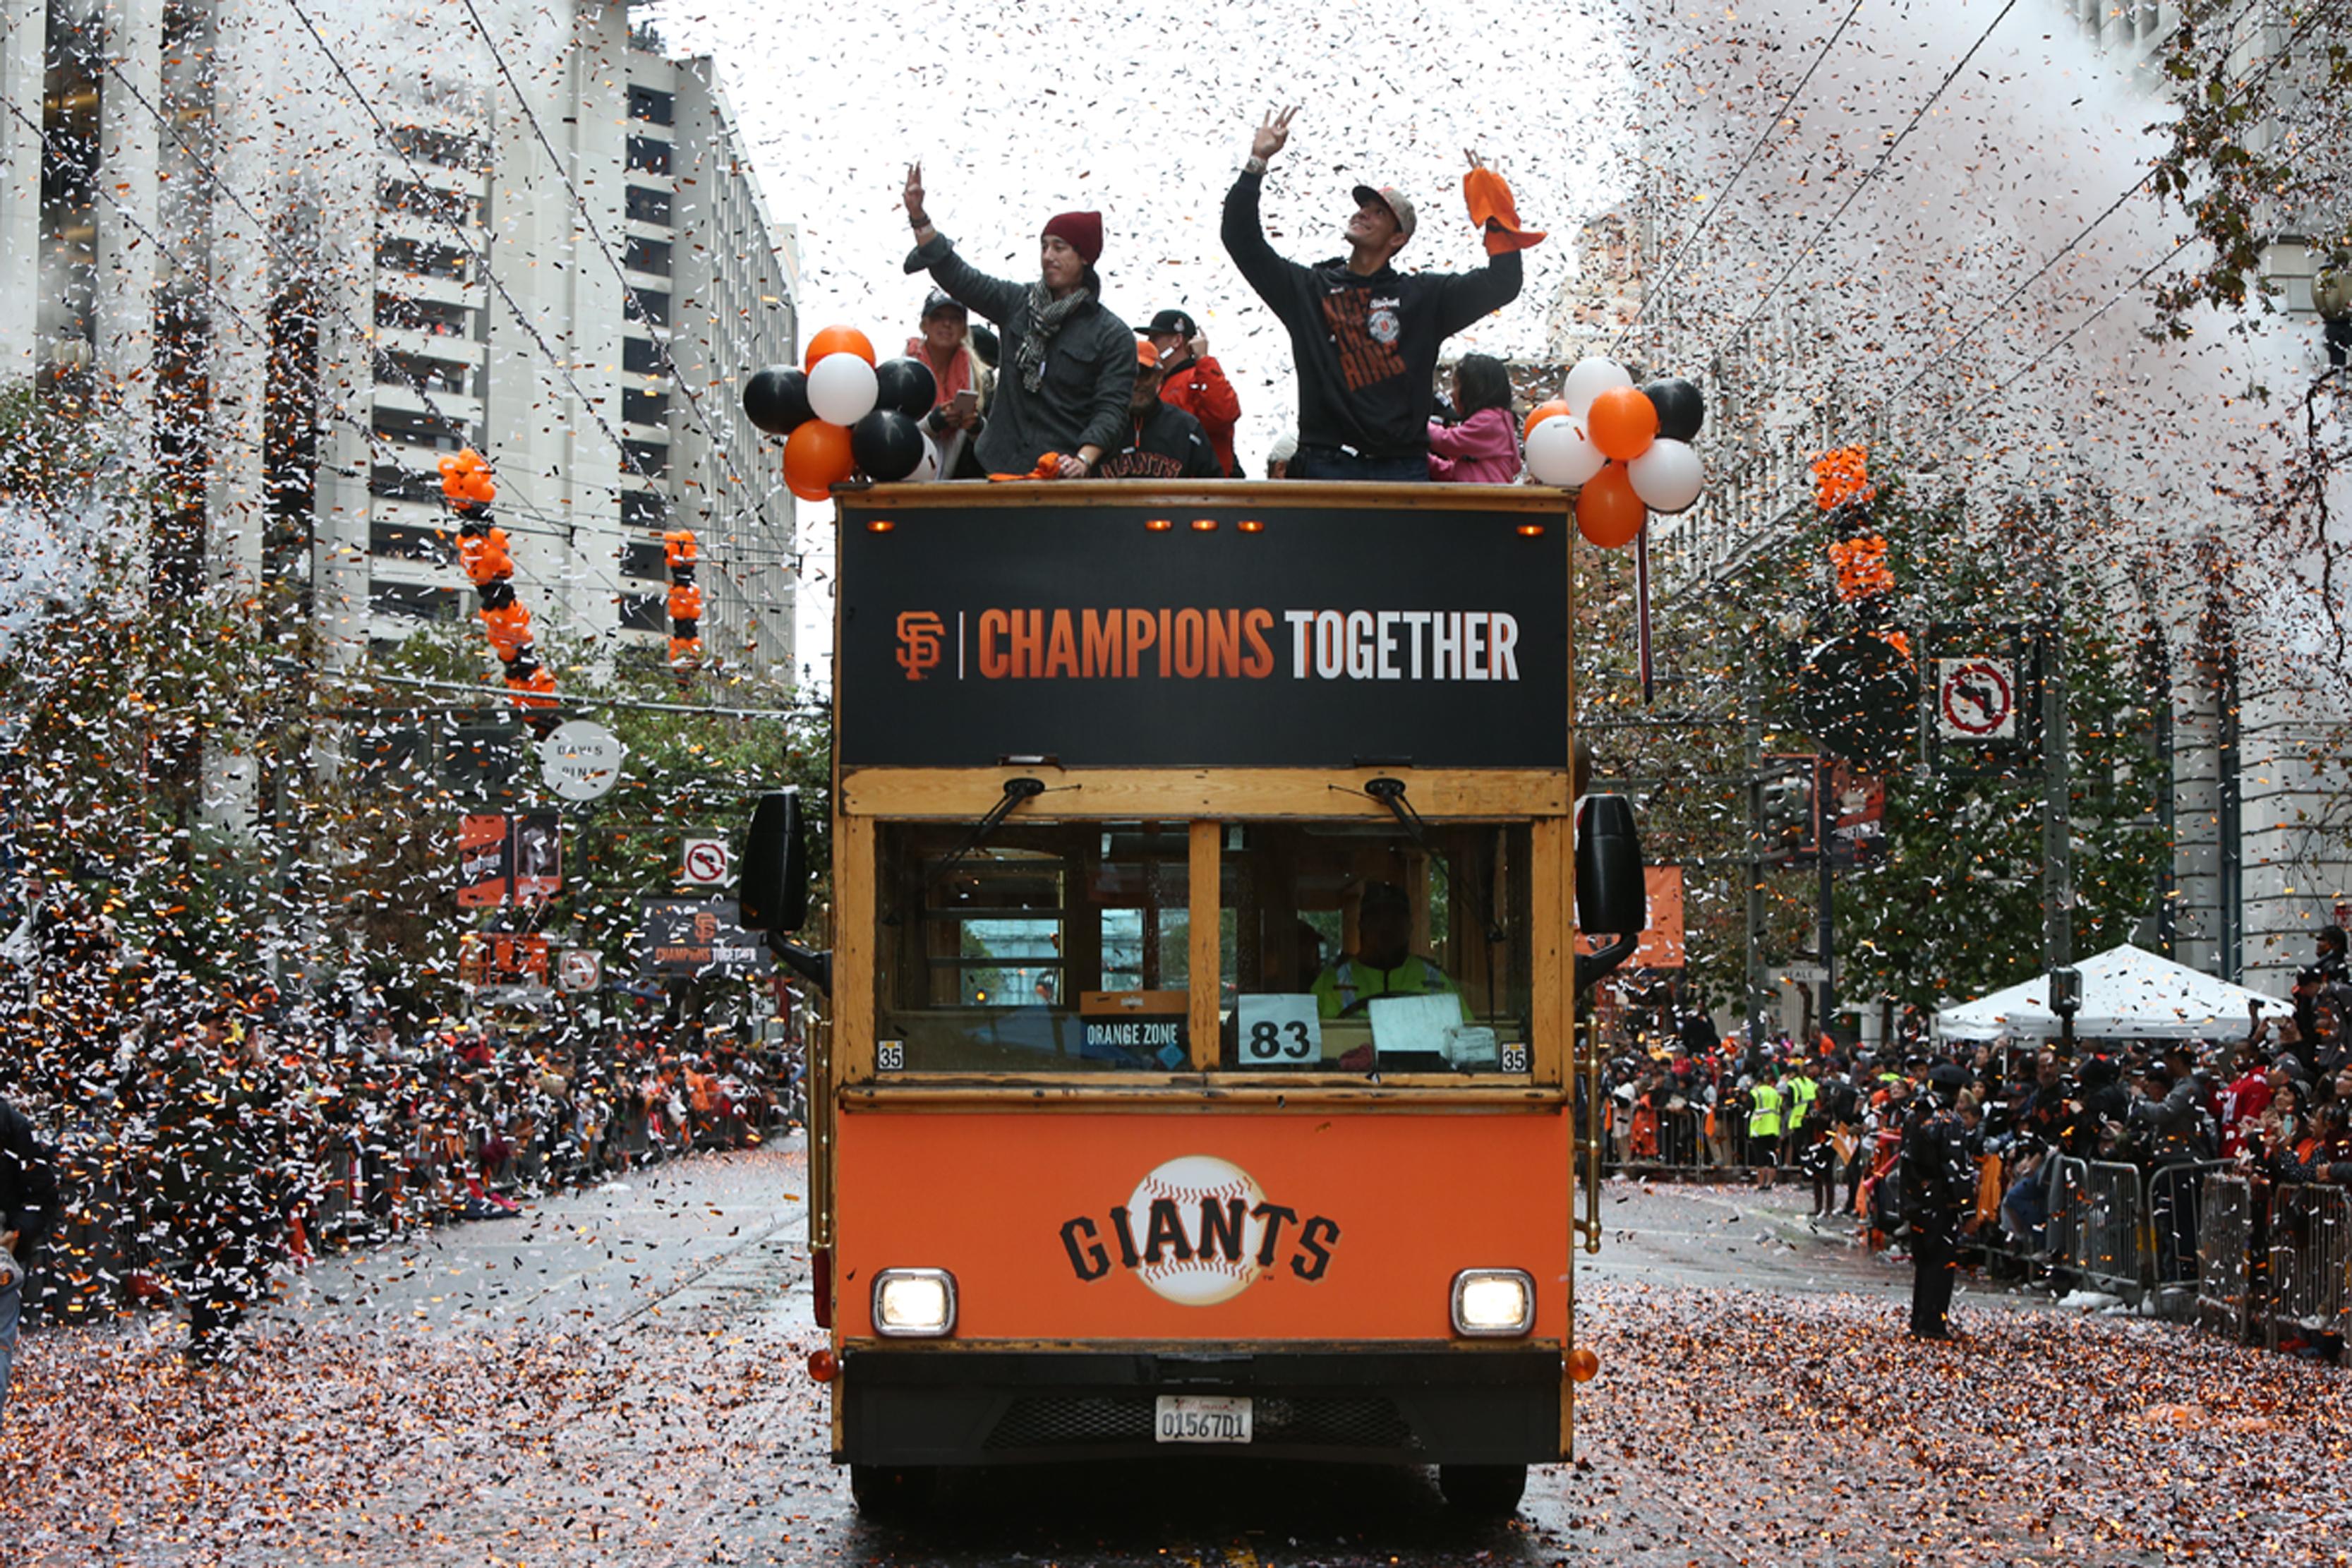 San Francisco Giants 2014 World Series victory parade